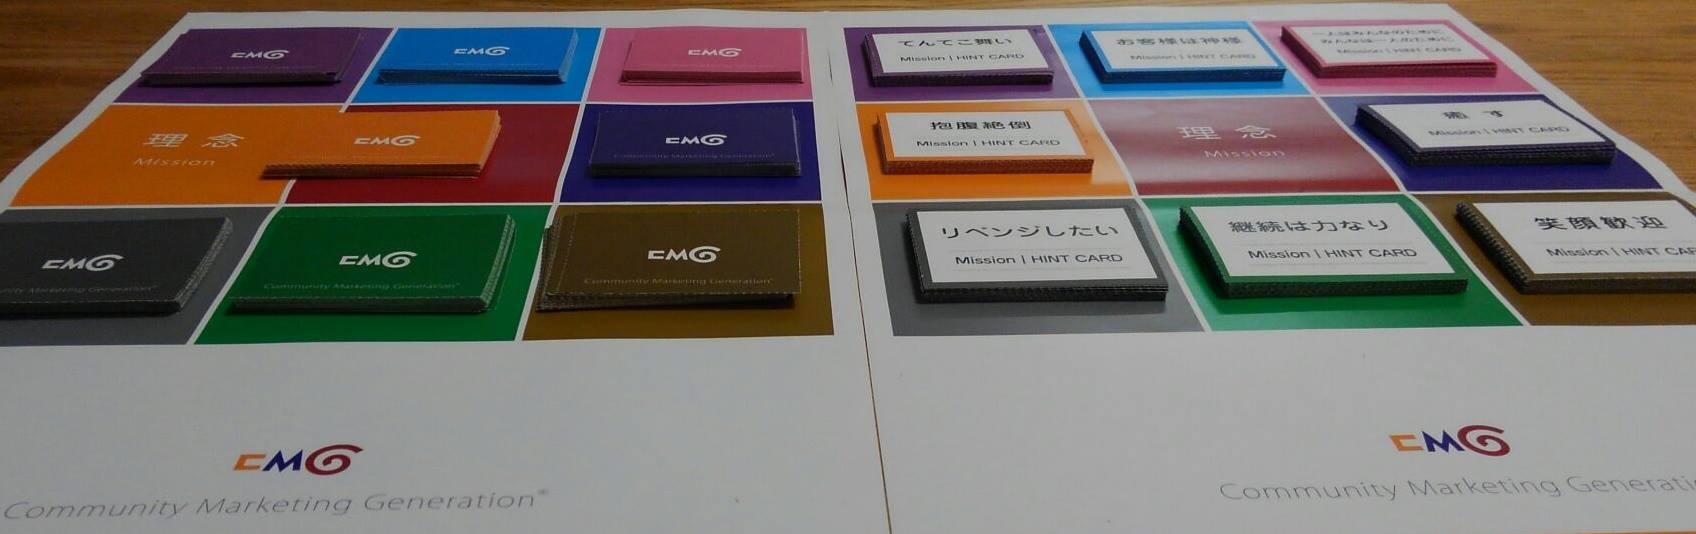 CMG「理念をデザインする」ワークショップ:画像